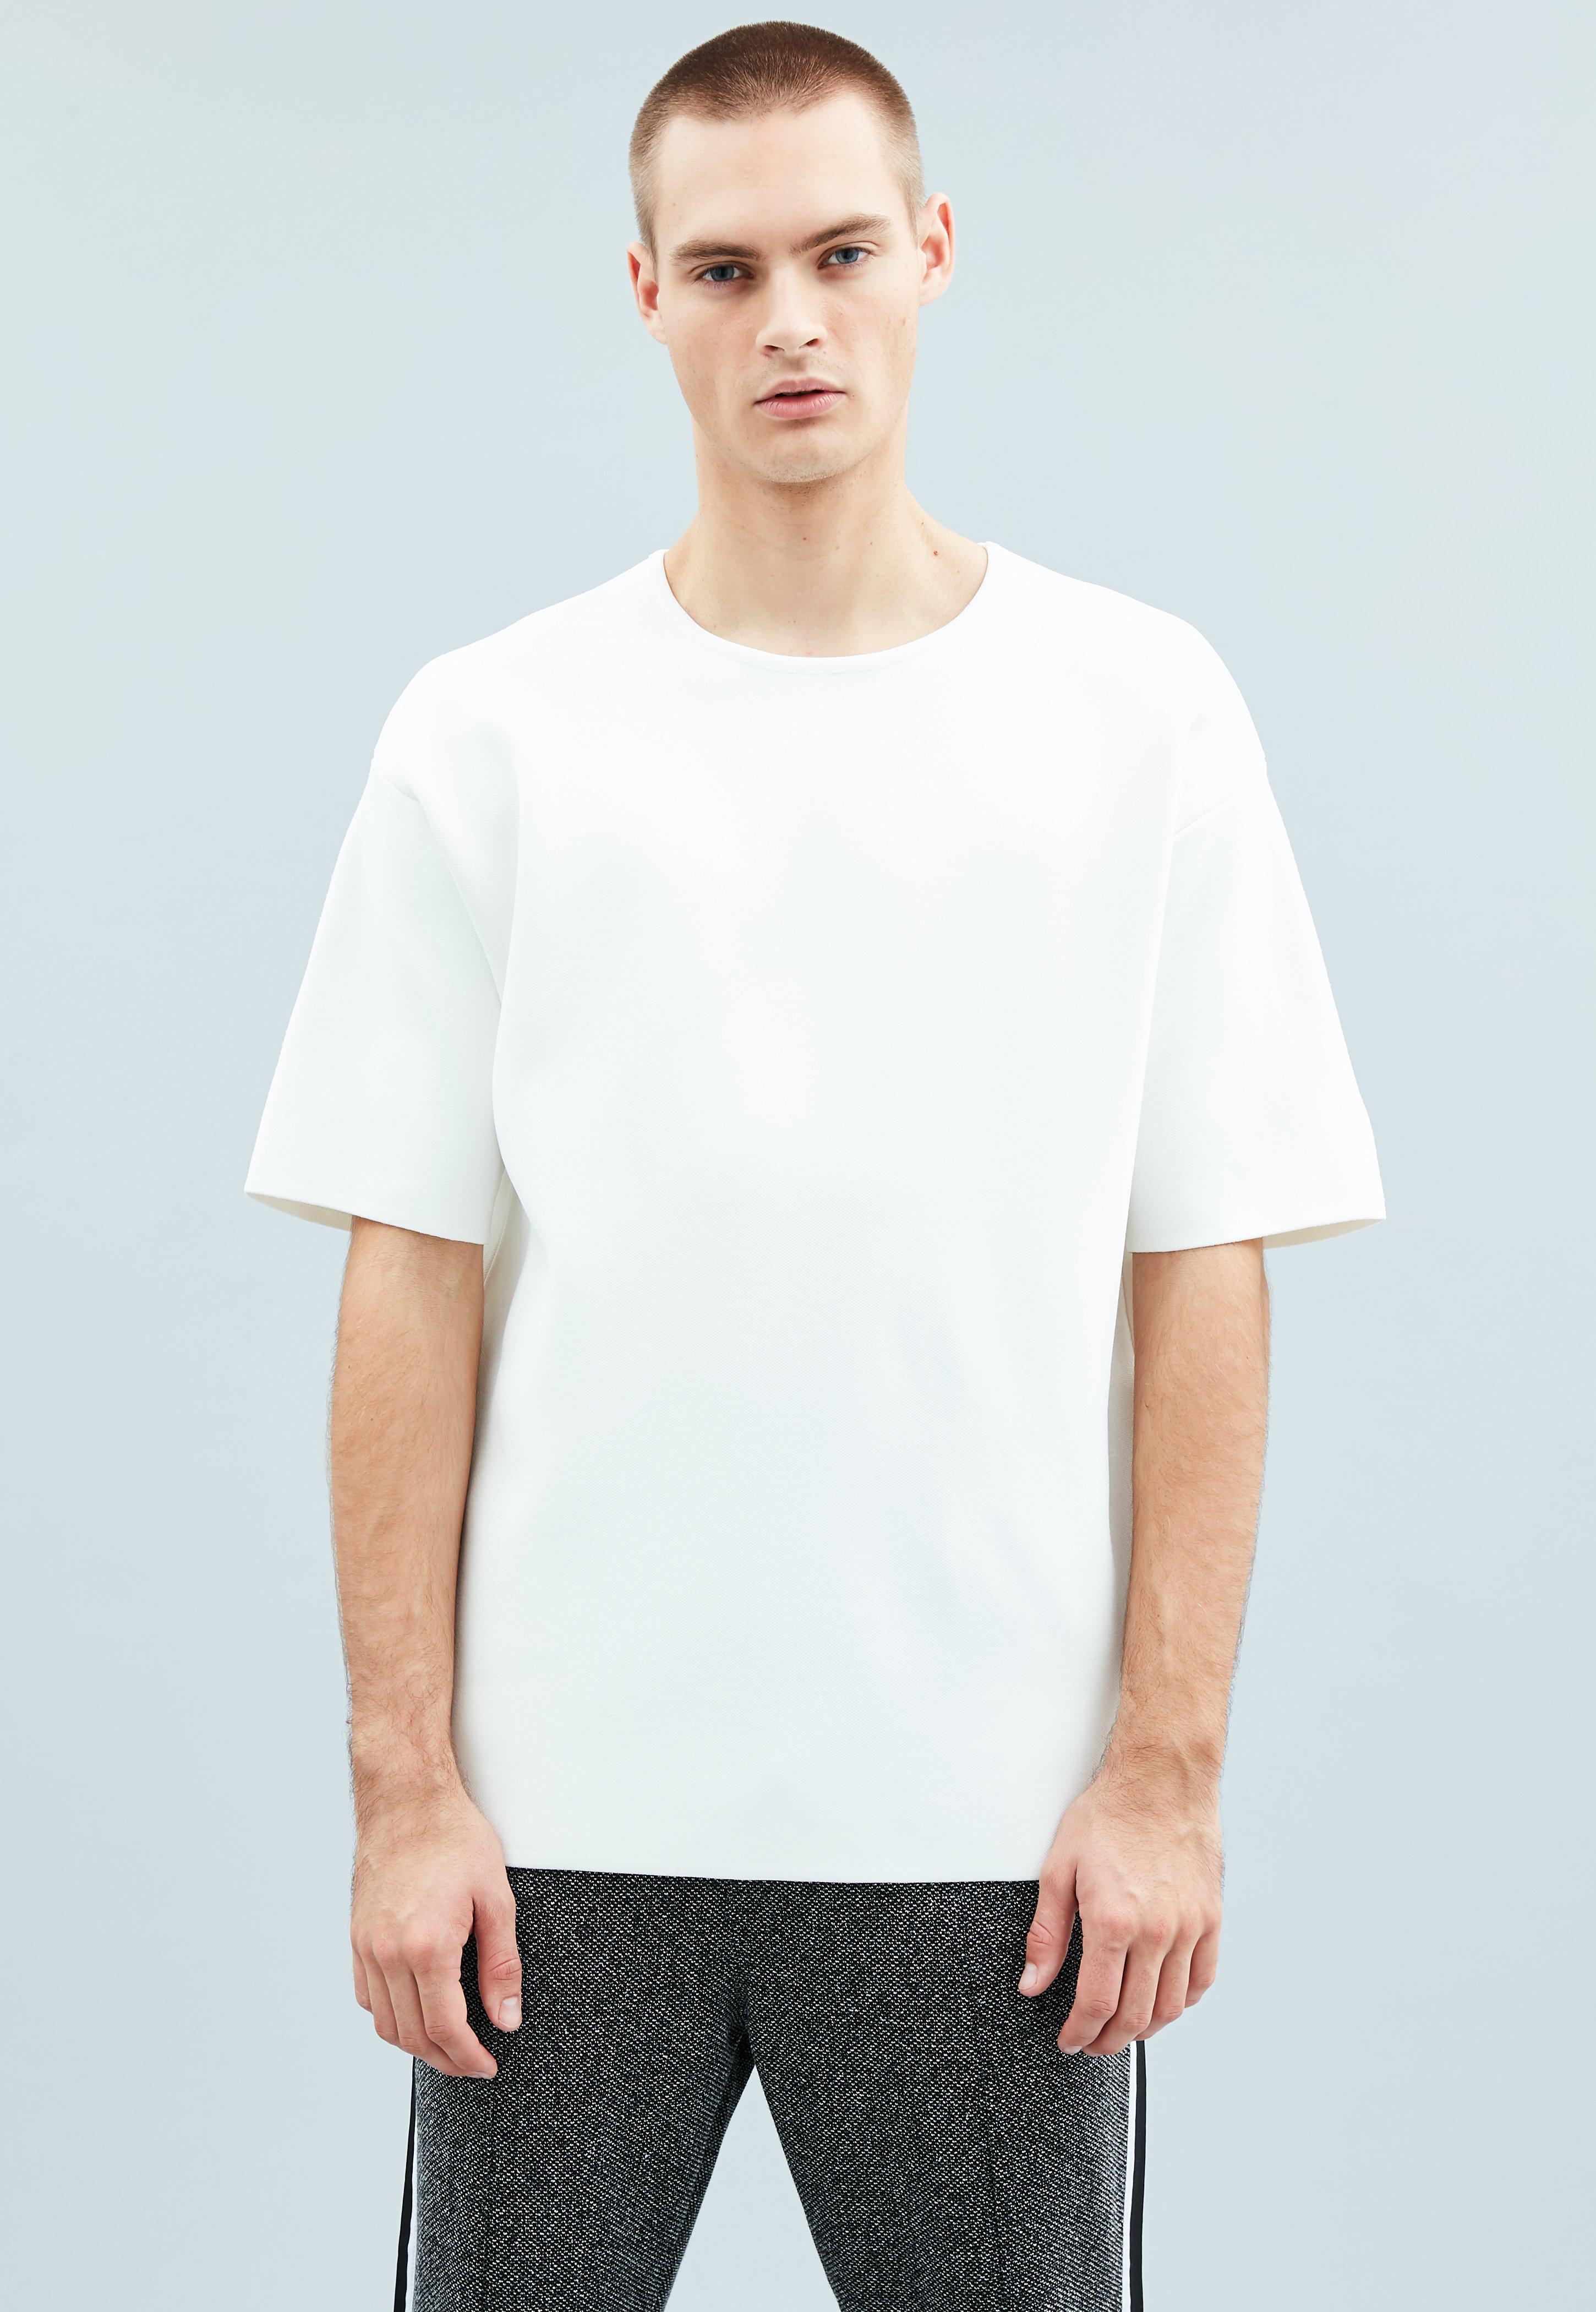 4464093321e1 Buy plain white baggy t shirt - 57% OFF! Share discount